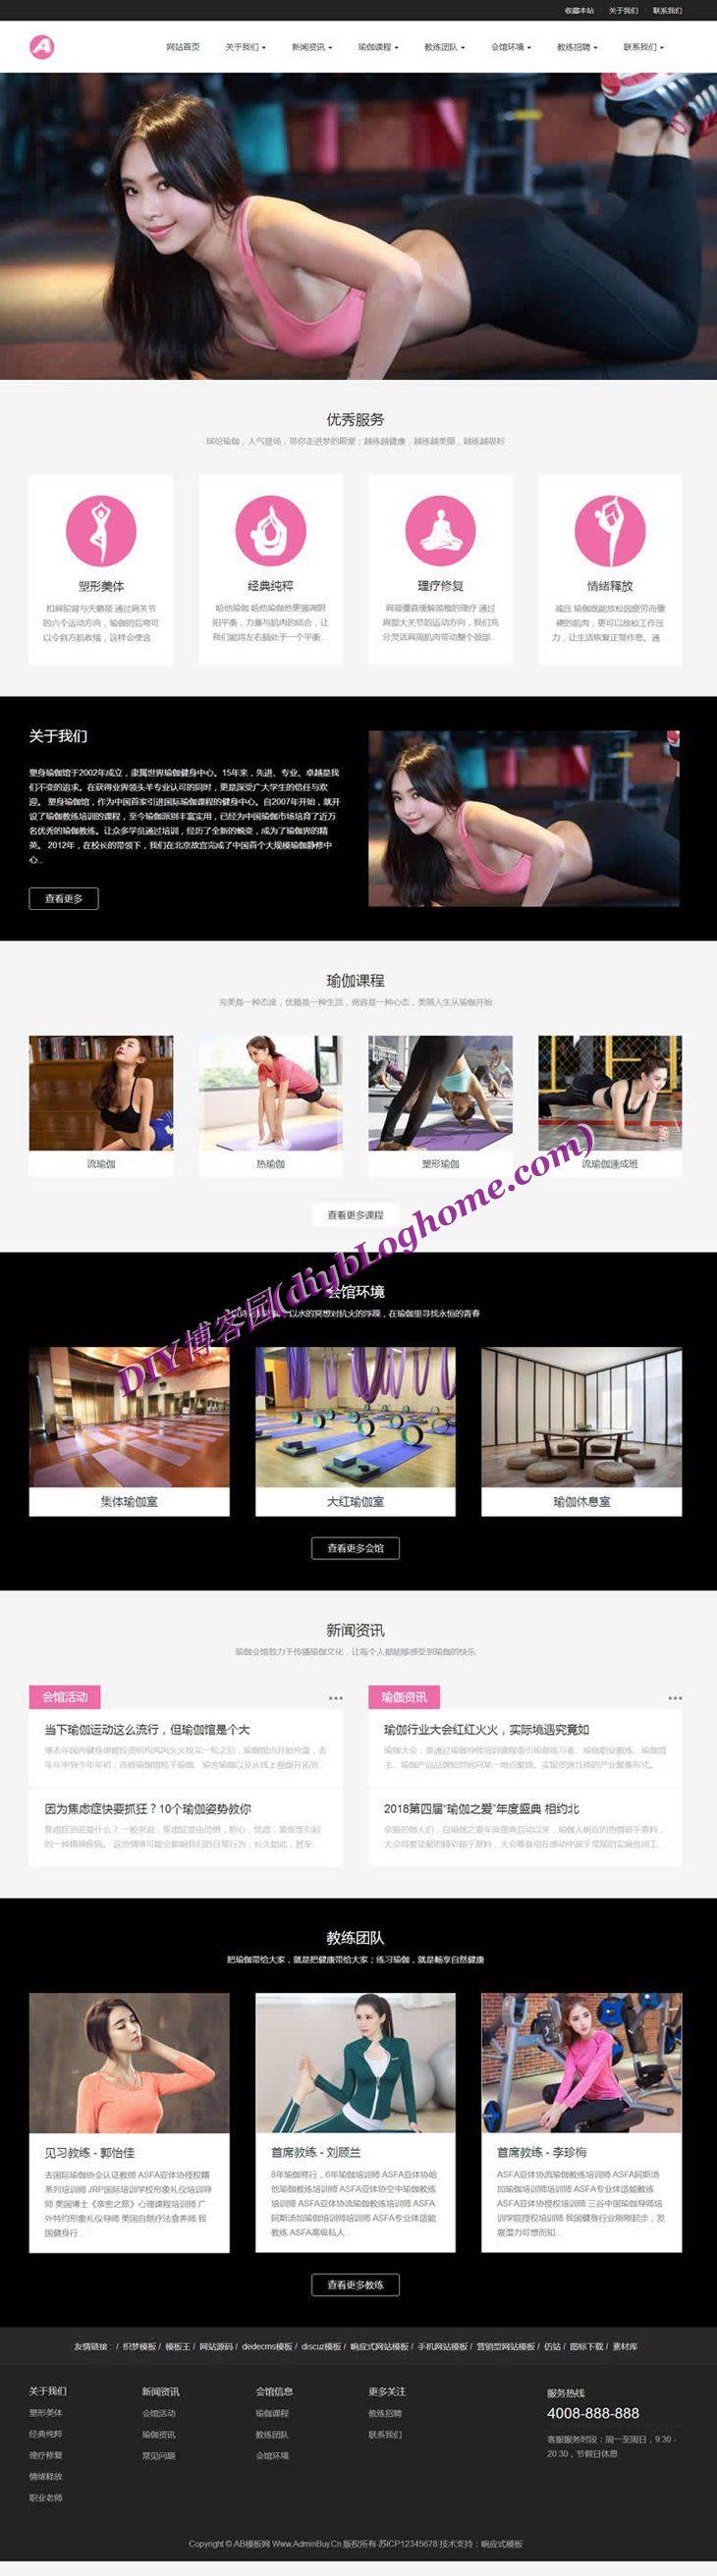 dedecms源码 Html5响应式瑜伽健身形体美术馆网站源码